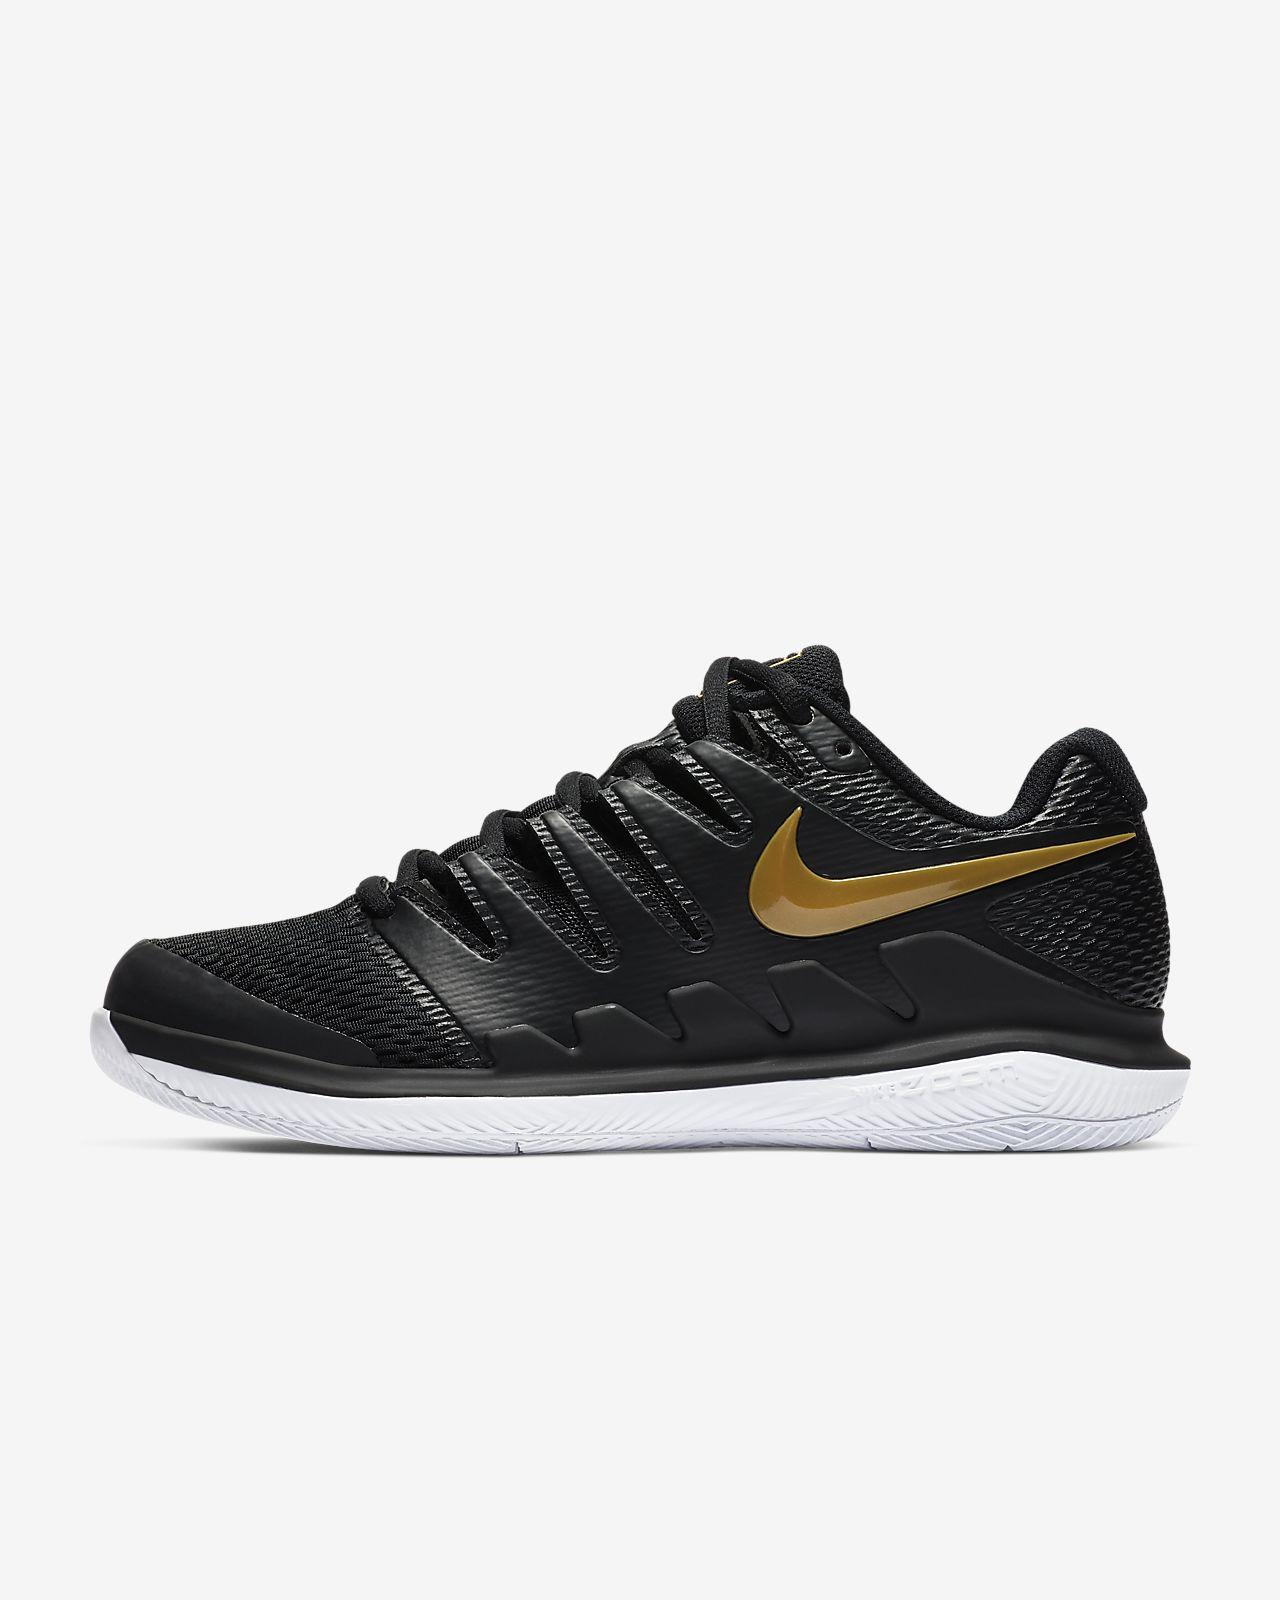 finest selection 399af 81081 Women s Hard Court Tennis Shoe. NikeCourt Air Zoom Vapor X